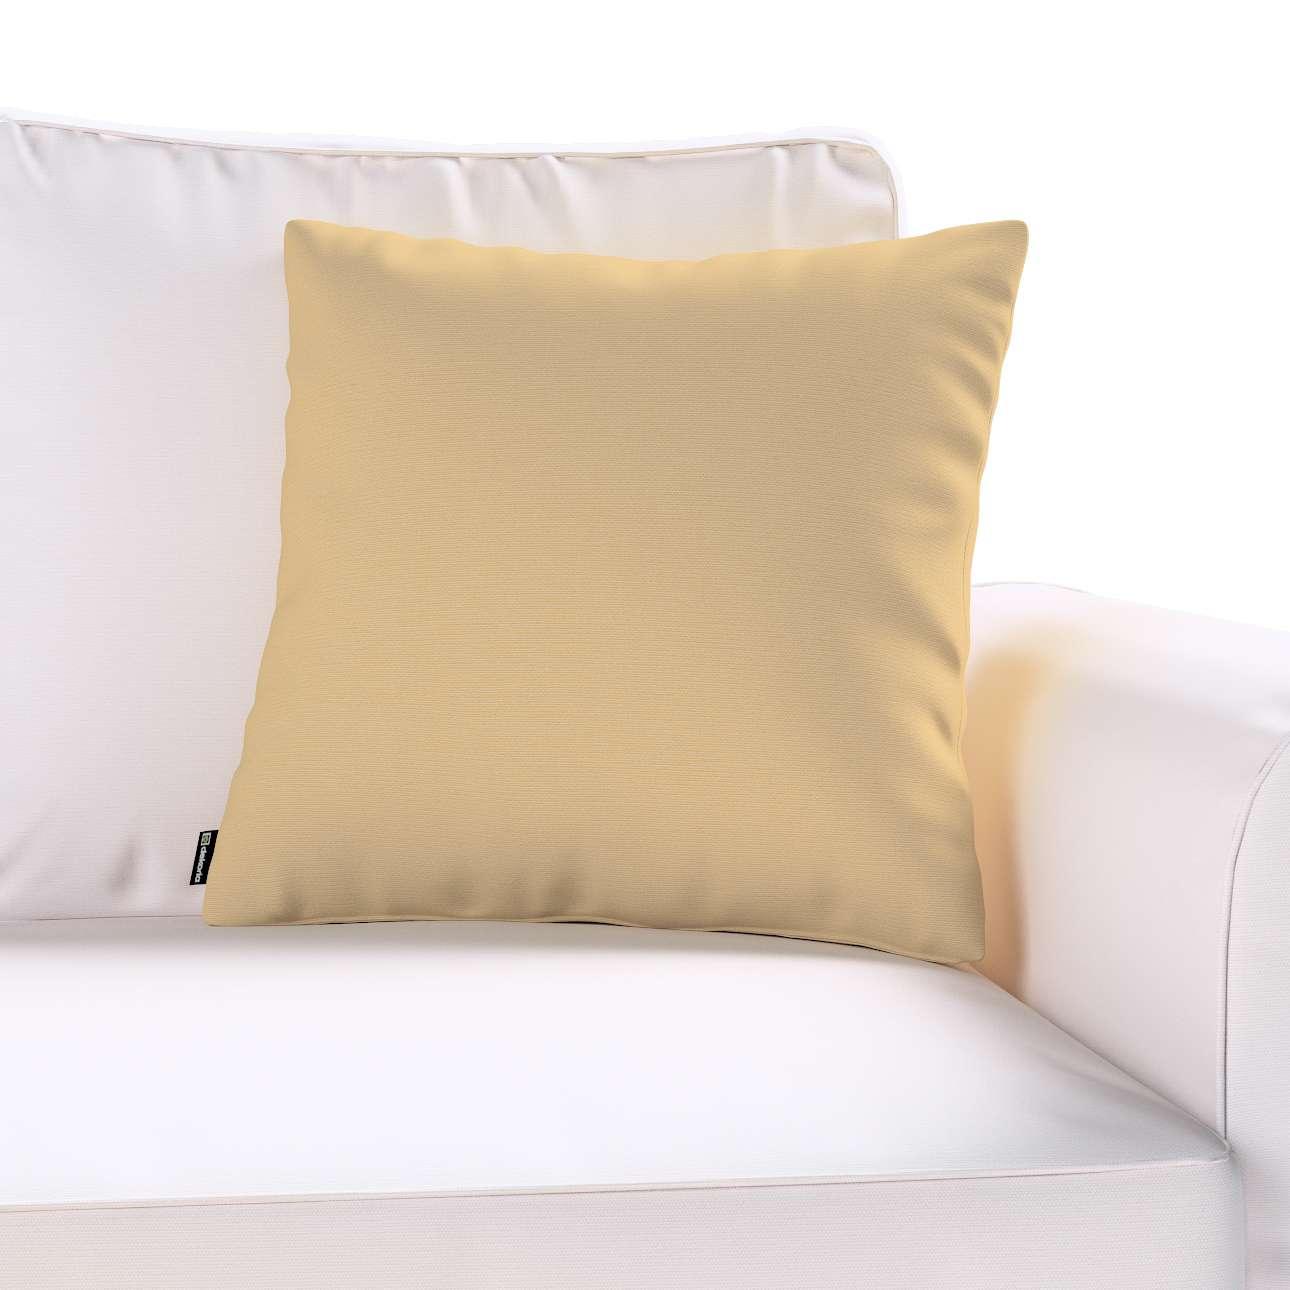 Kinga - potah na polštář jednoduchý 43 x 43 cm v kolekci Cotton Panama, látka: 702-01